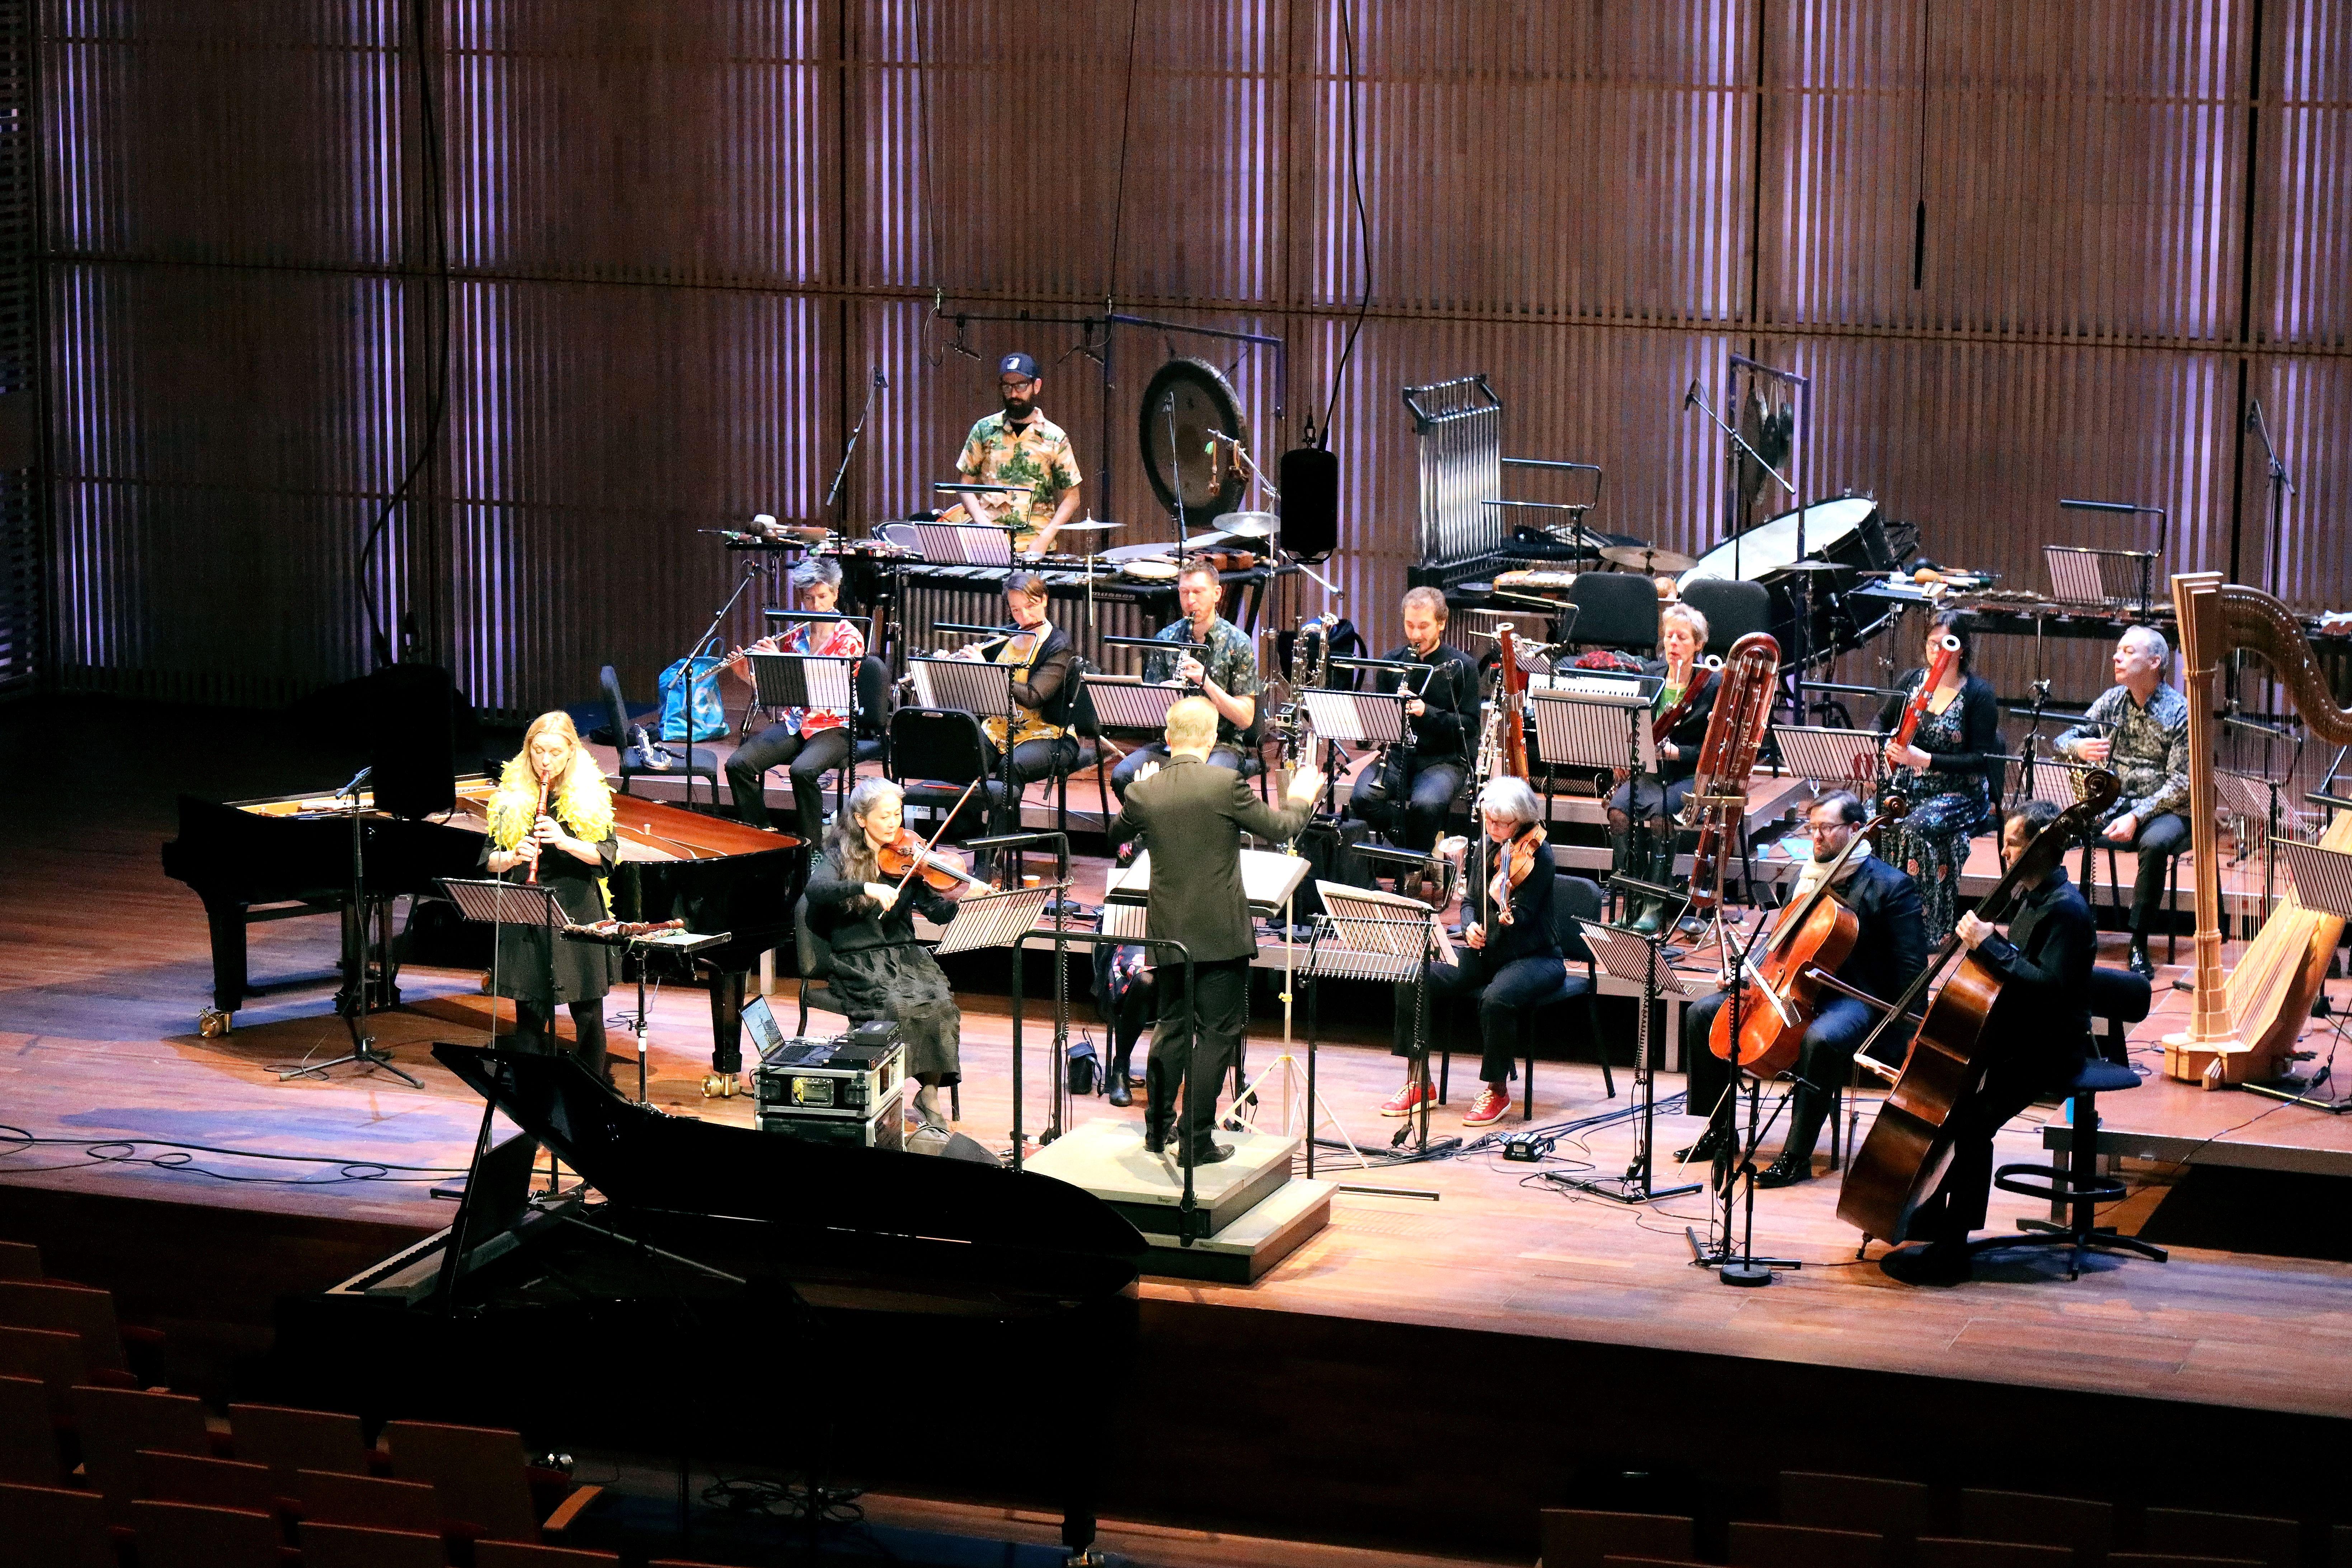 God's own musicians - Jukka Tiensuu - Appo